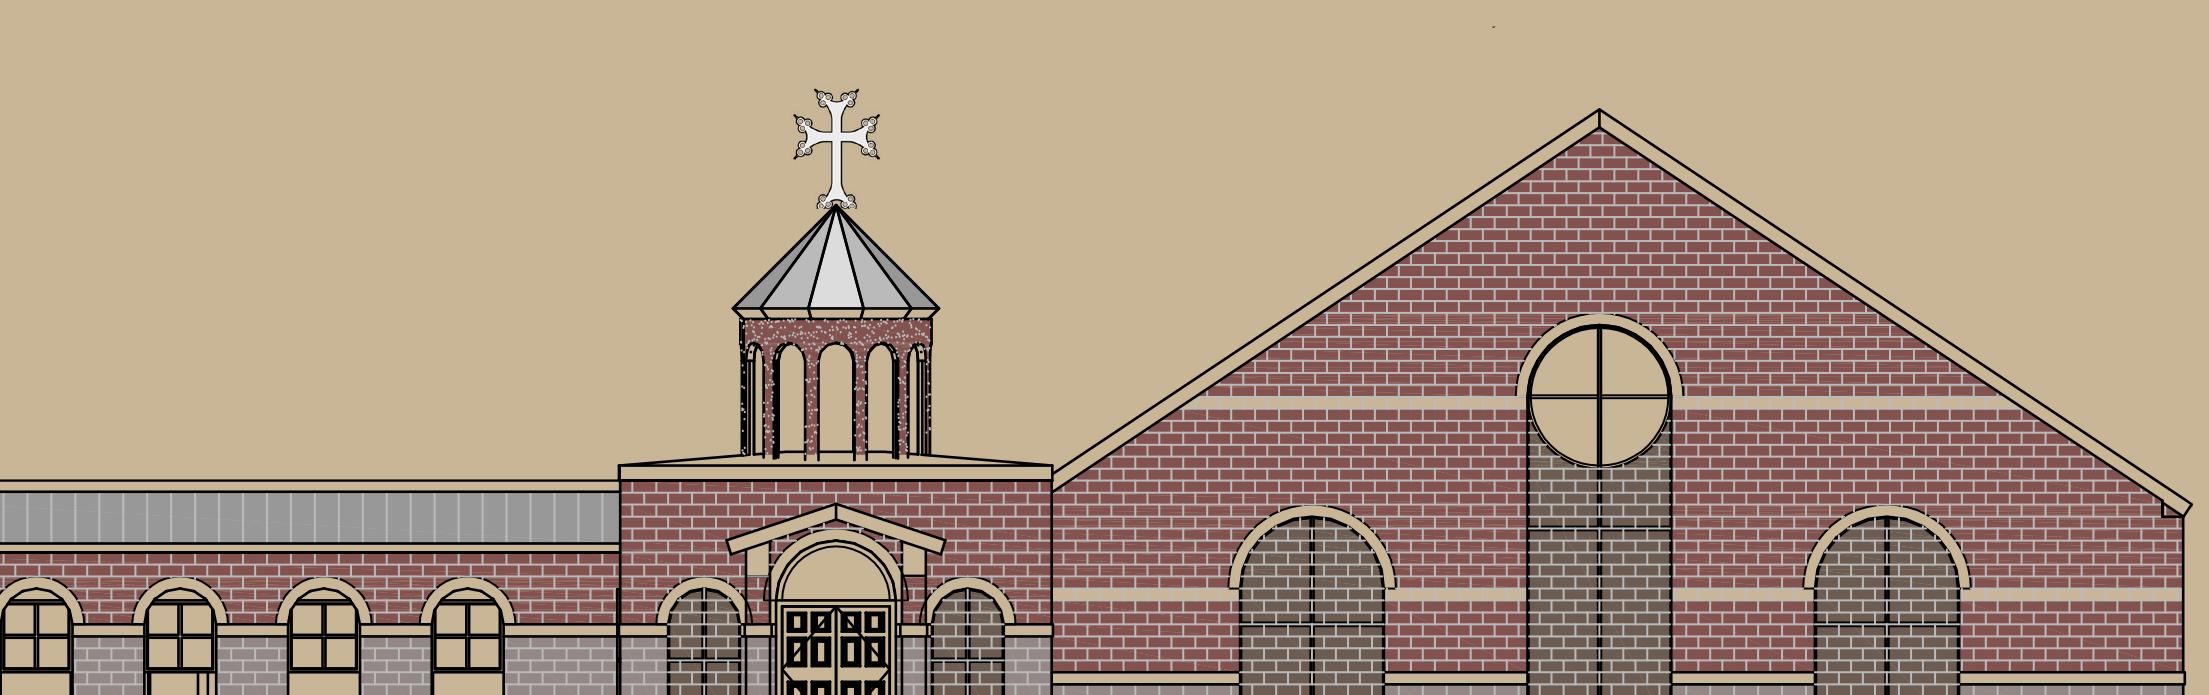 Hye Pointe Armenian Church